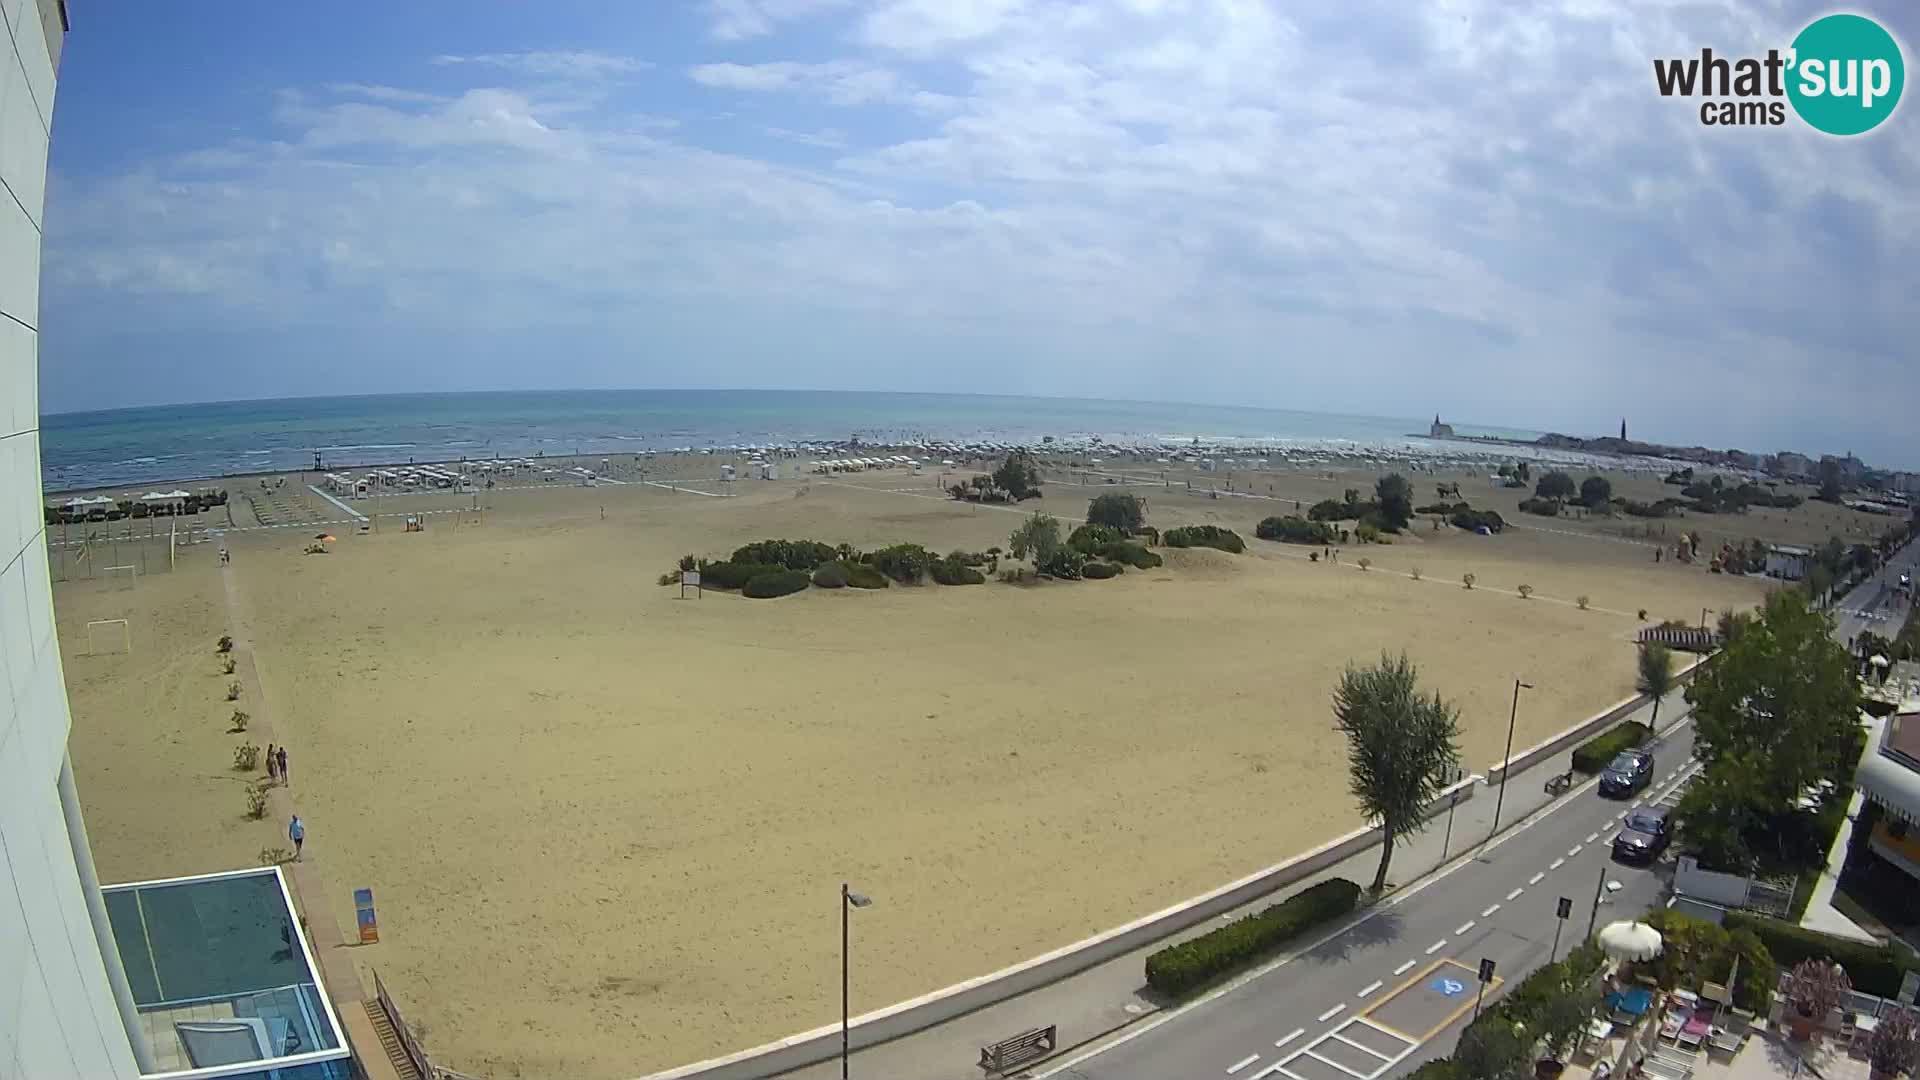 Hotel Panoramic Live cam Caorle plage Levante webcam – Italie